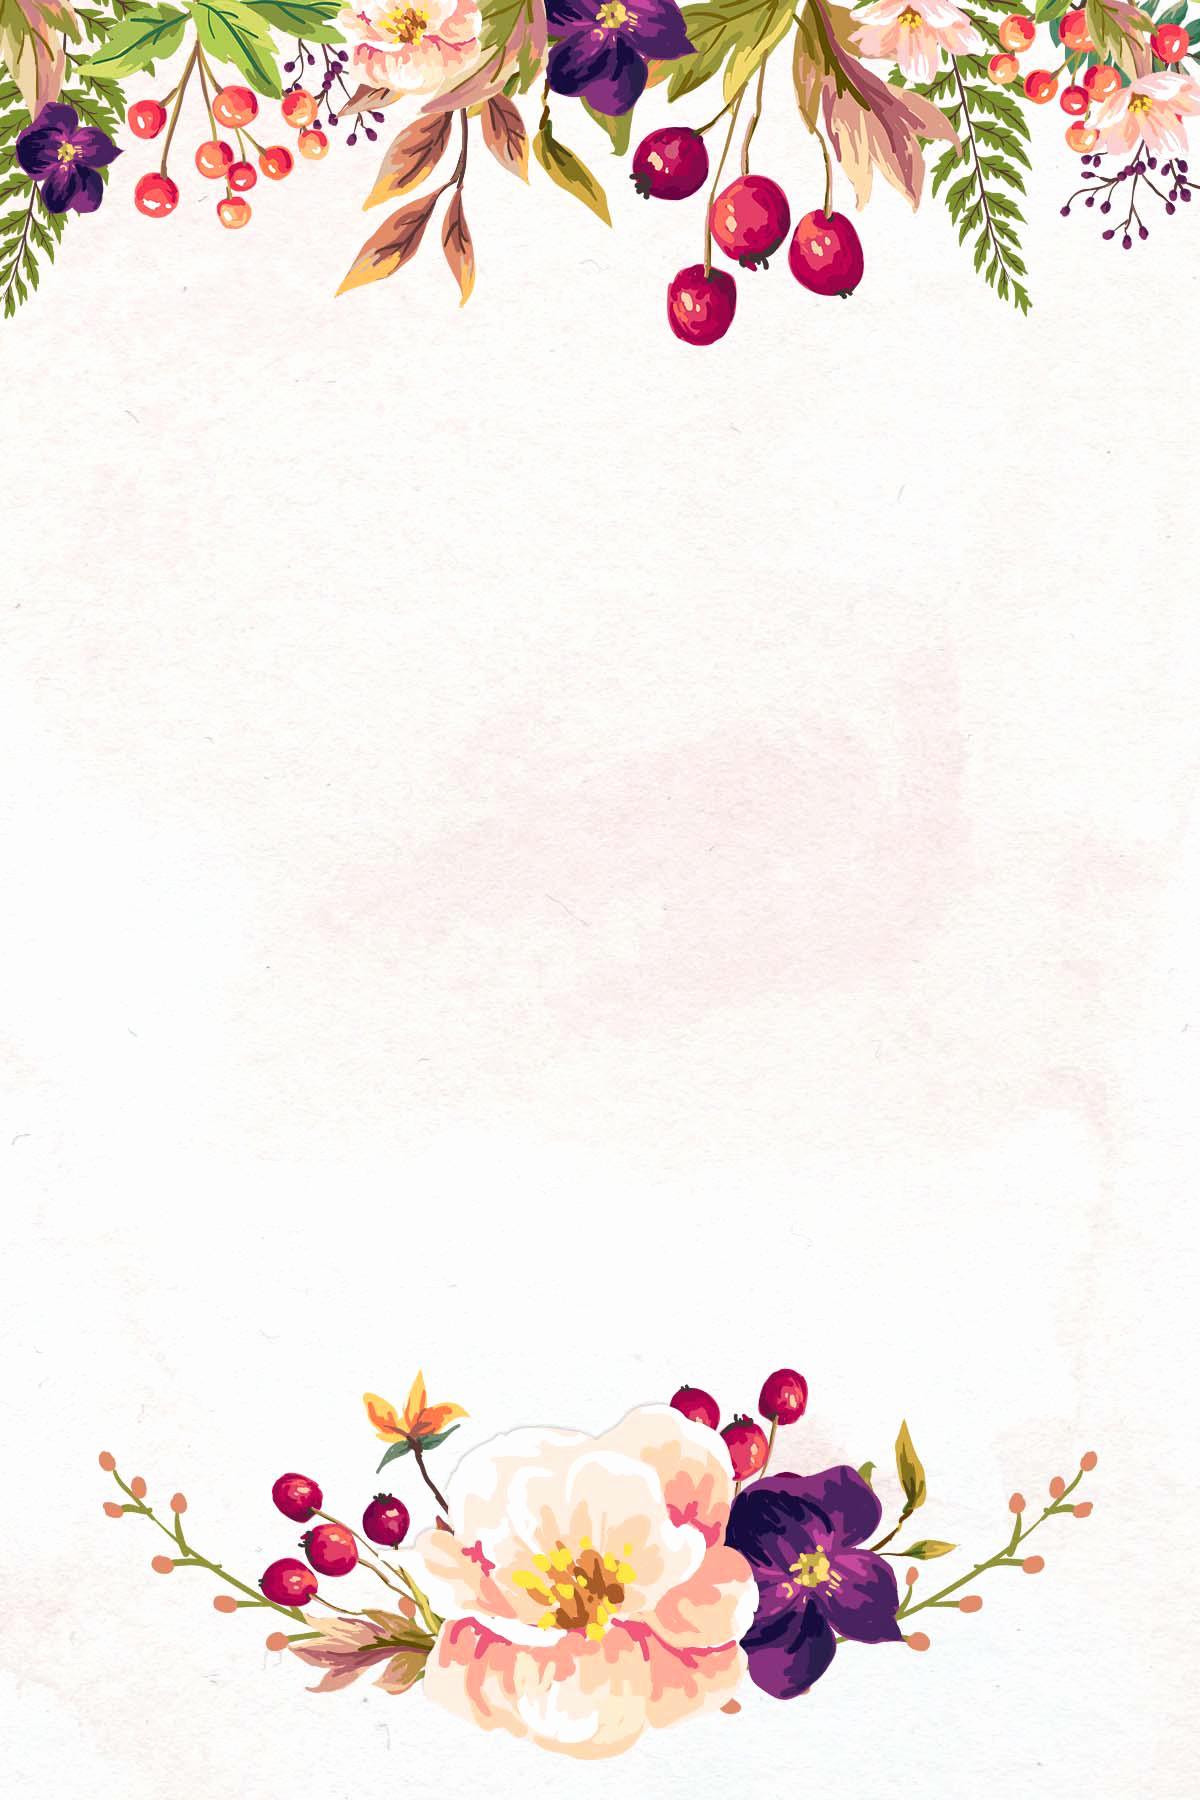 Blank Wedding Invitation Templates New Blank Invitation Cards